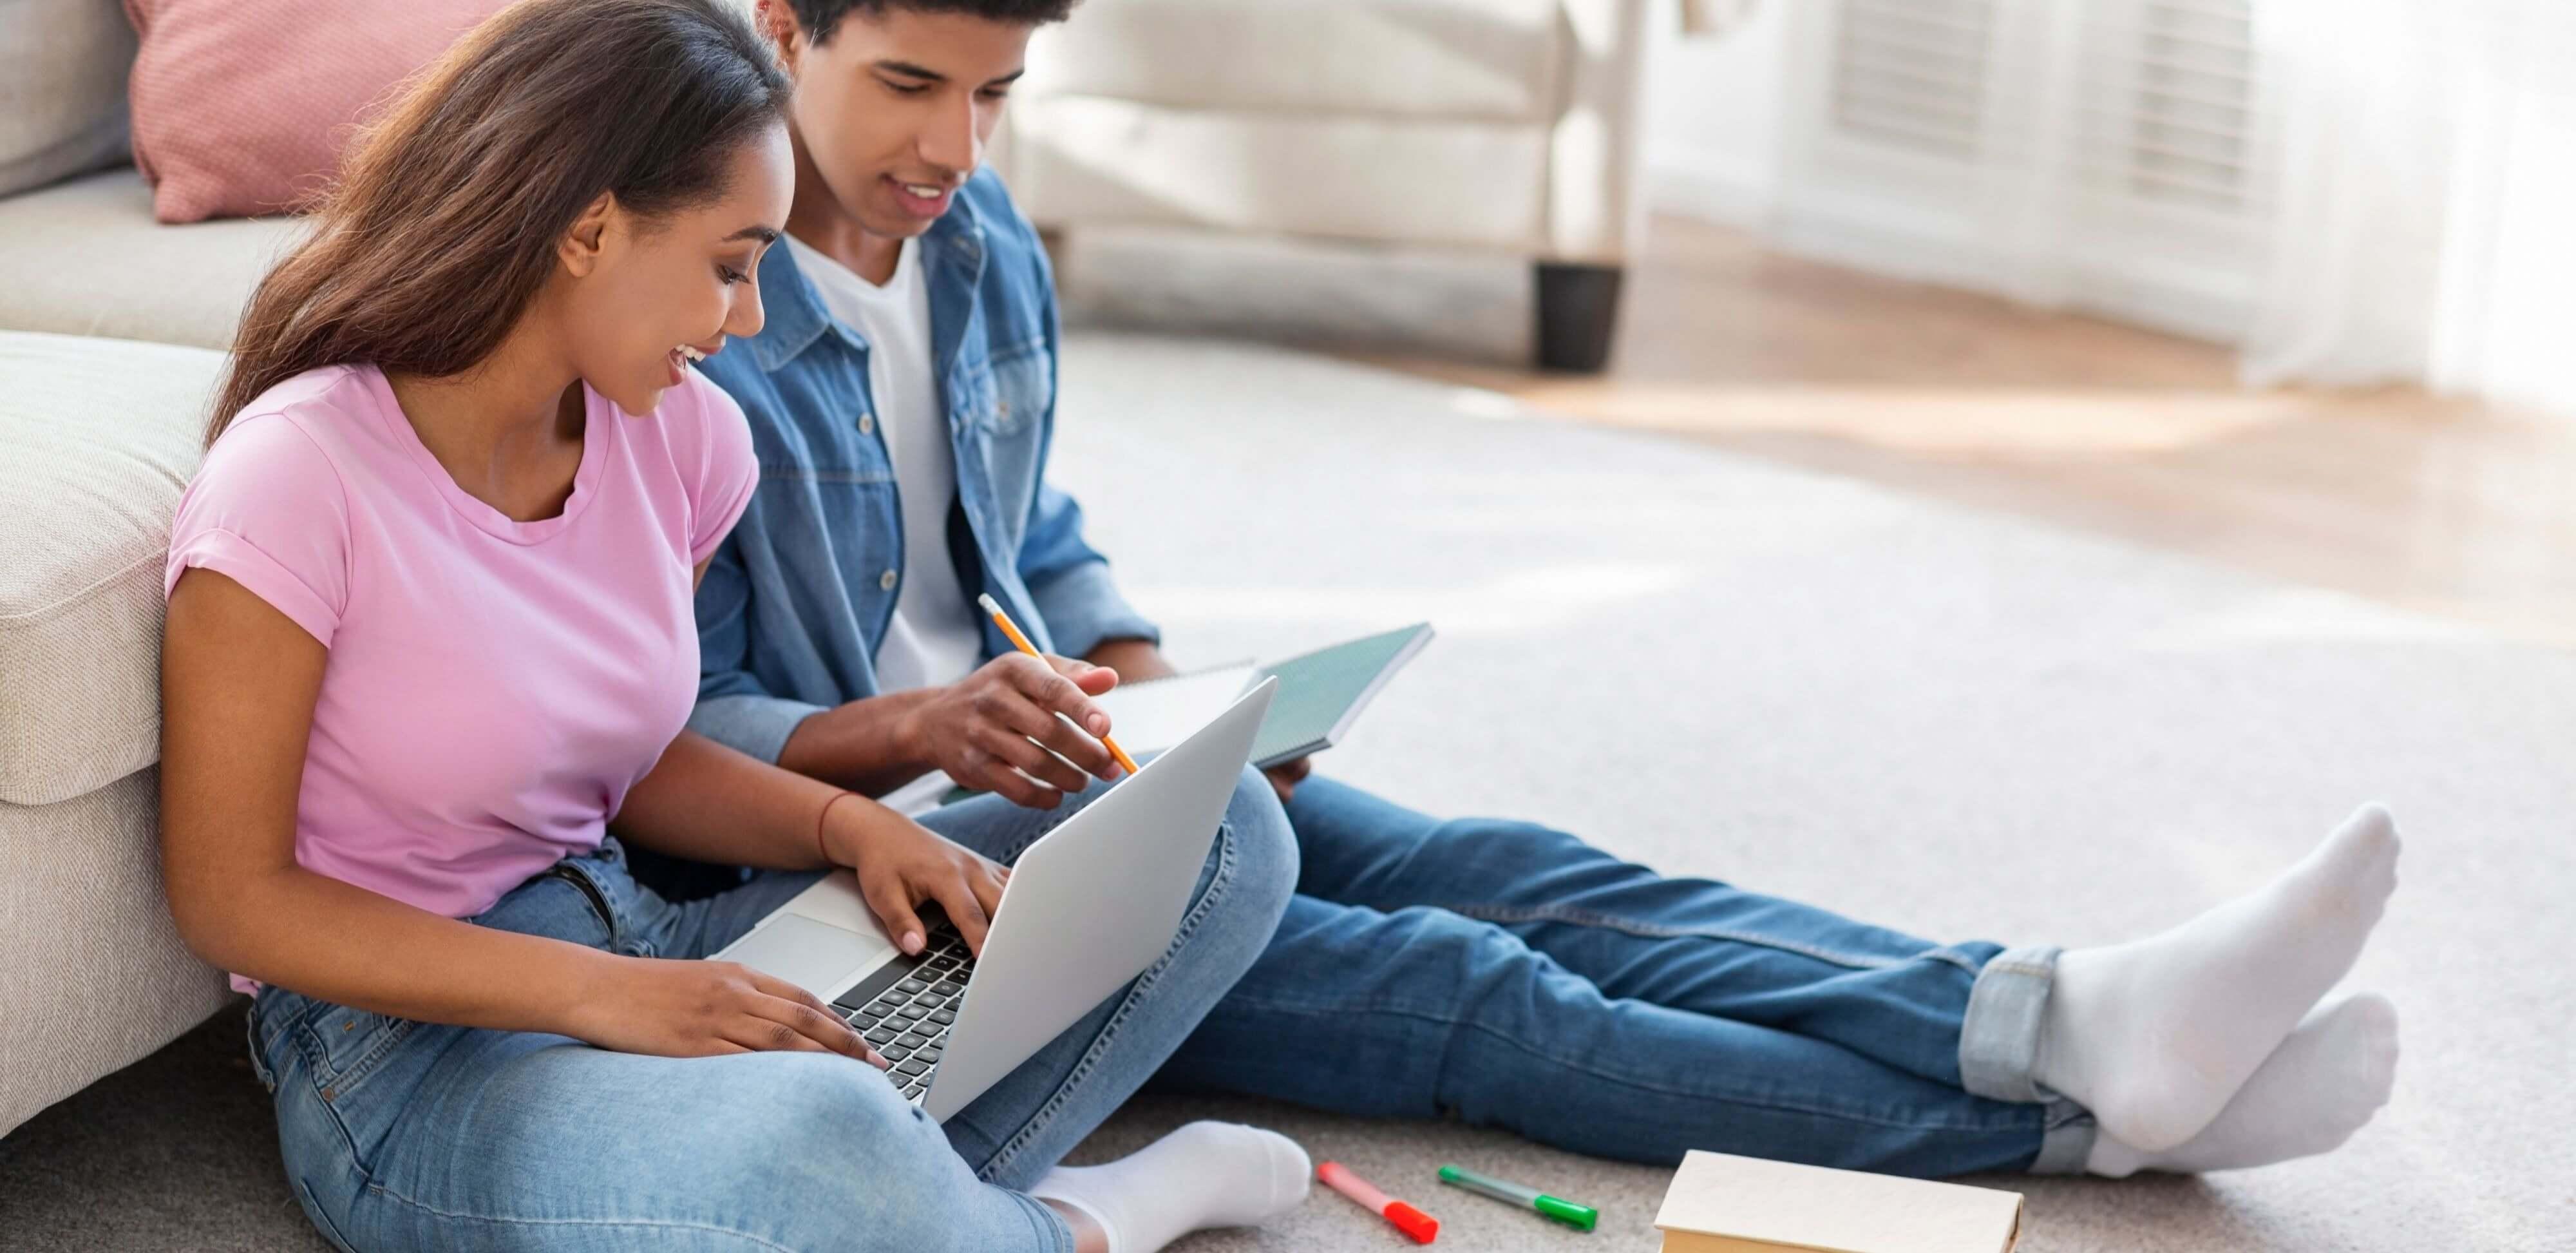 vozes verbais: jovens estudando juntos